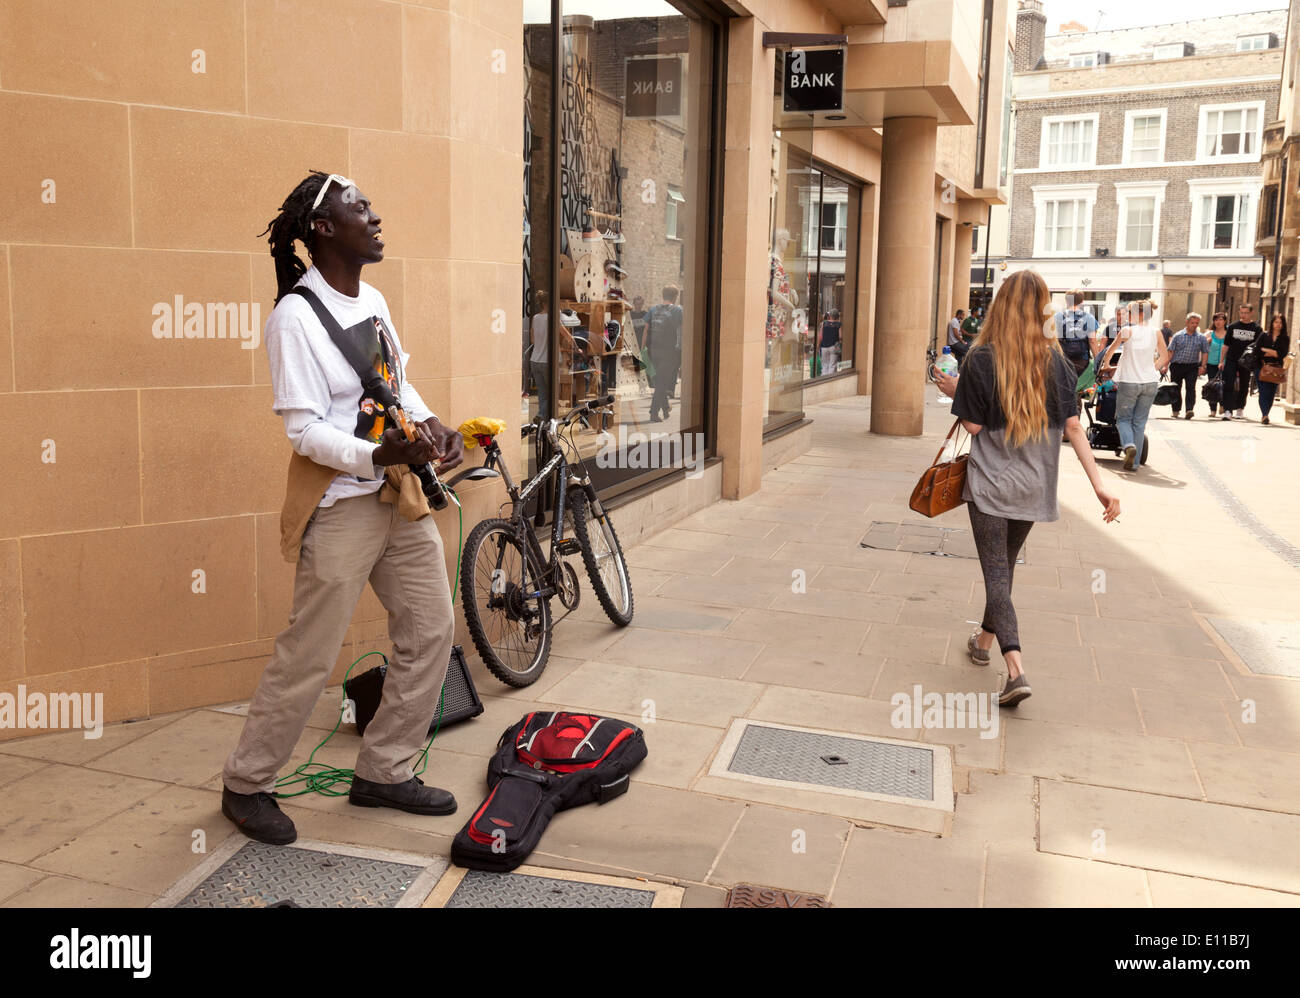 A black street performer musician playing a guitar, Cambridge, UK - Stock Image